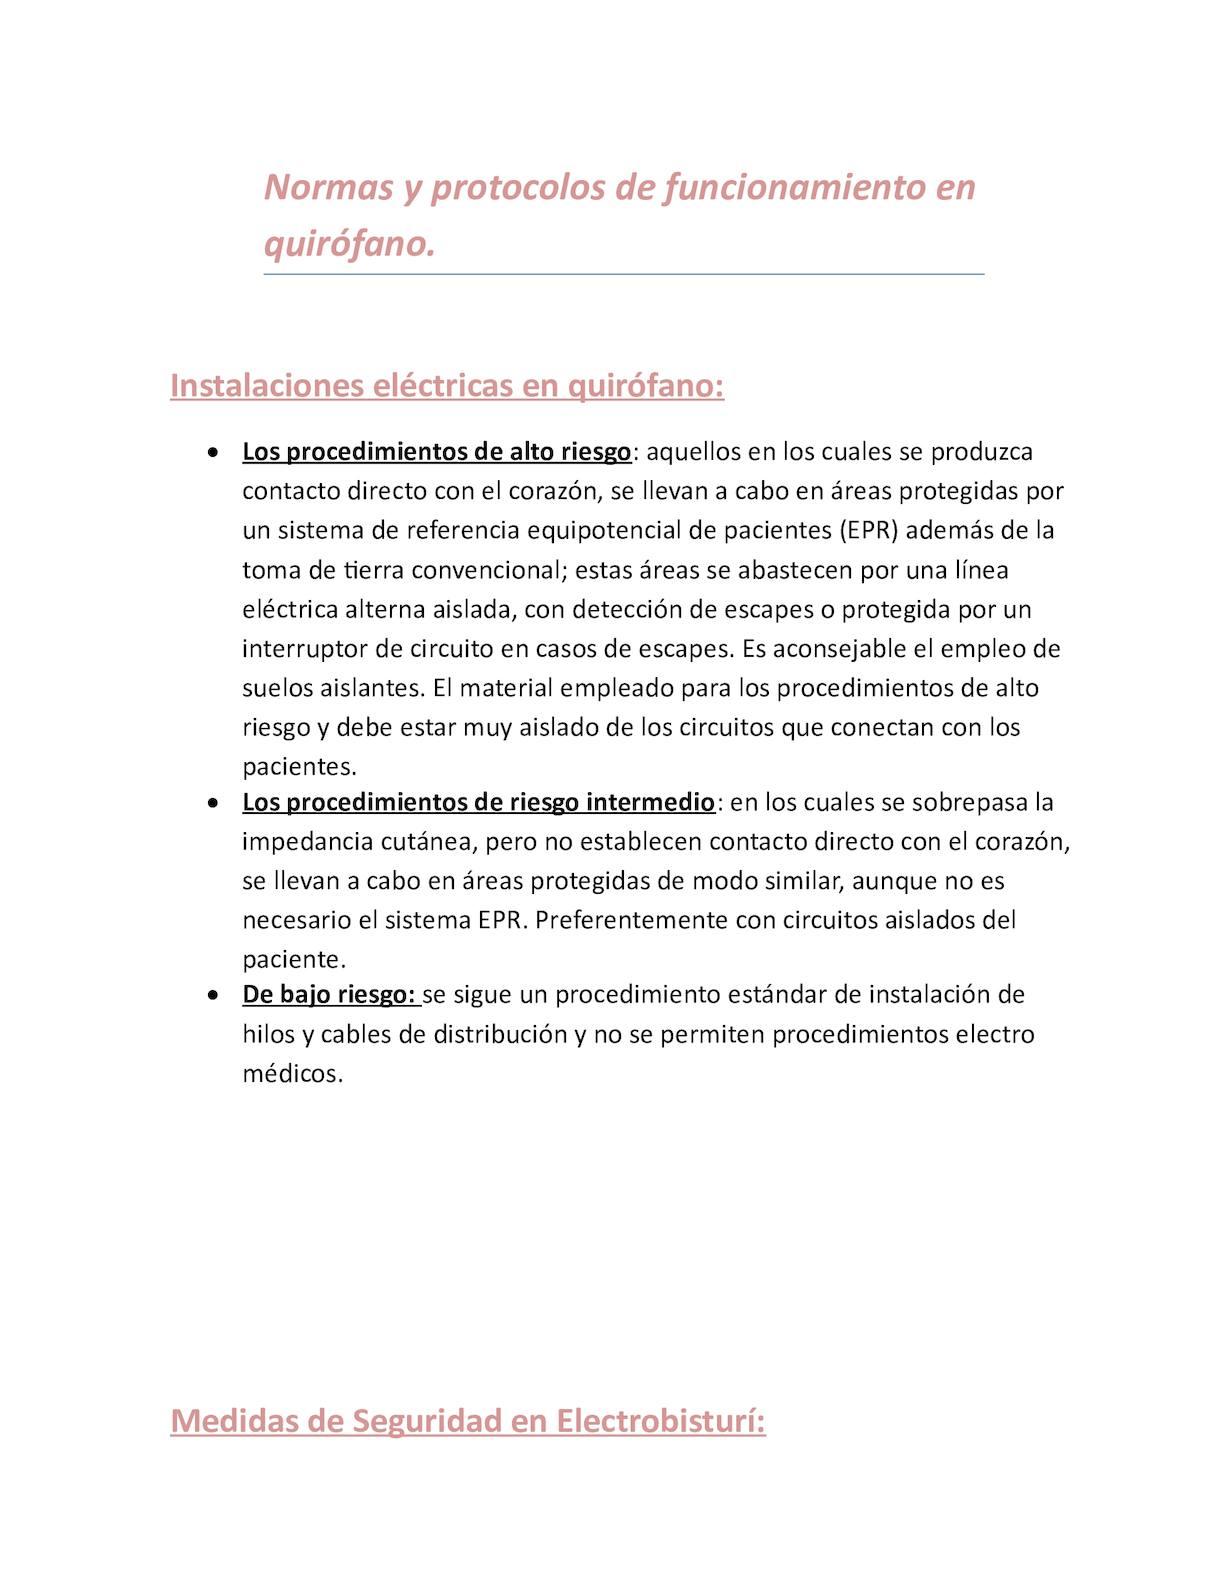 Circuito Quirurgico : Calaméo normas de seguridad para un quirófano seguro